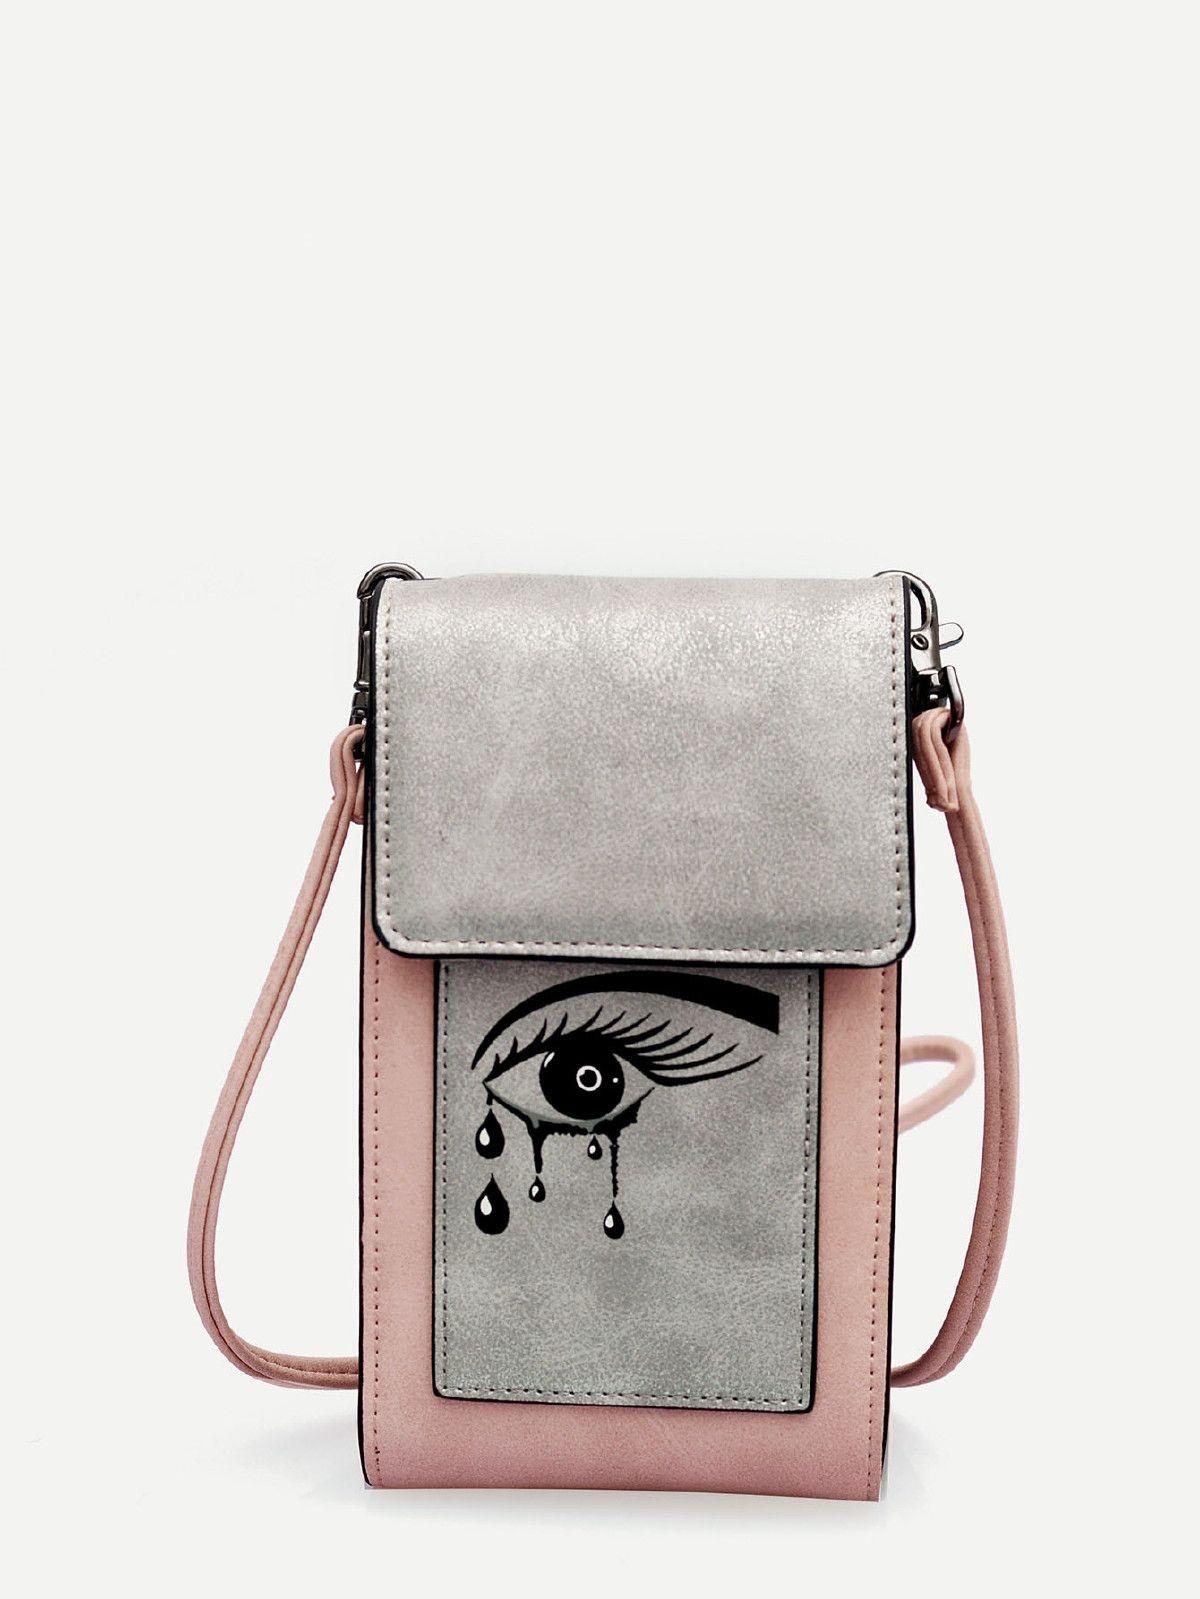 076a019bdb182 Eye Print Flap Crossbody Bag | Funny, cool bags | Bags, Crossbody ...